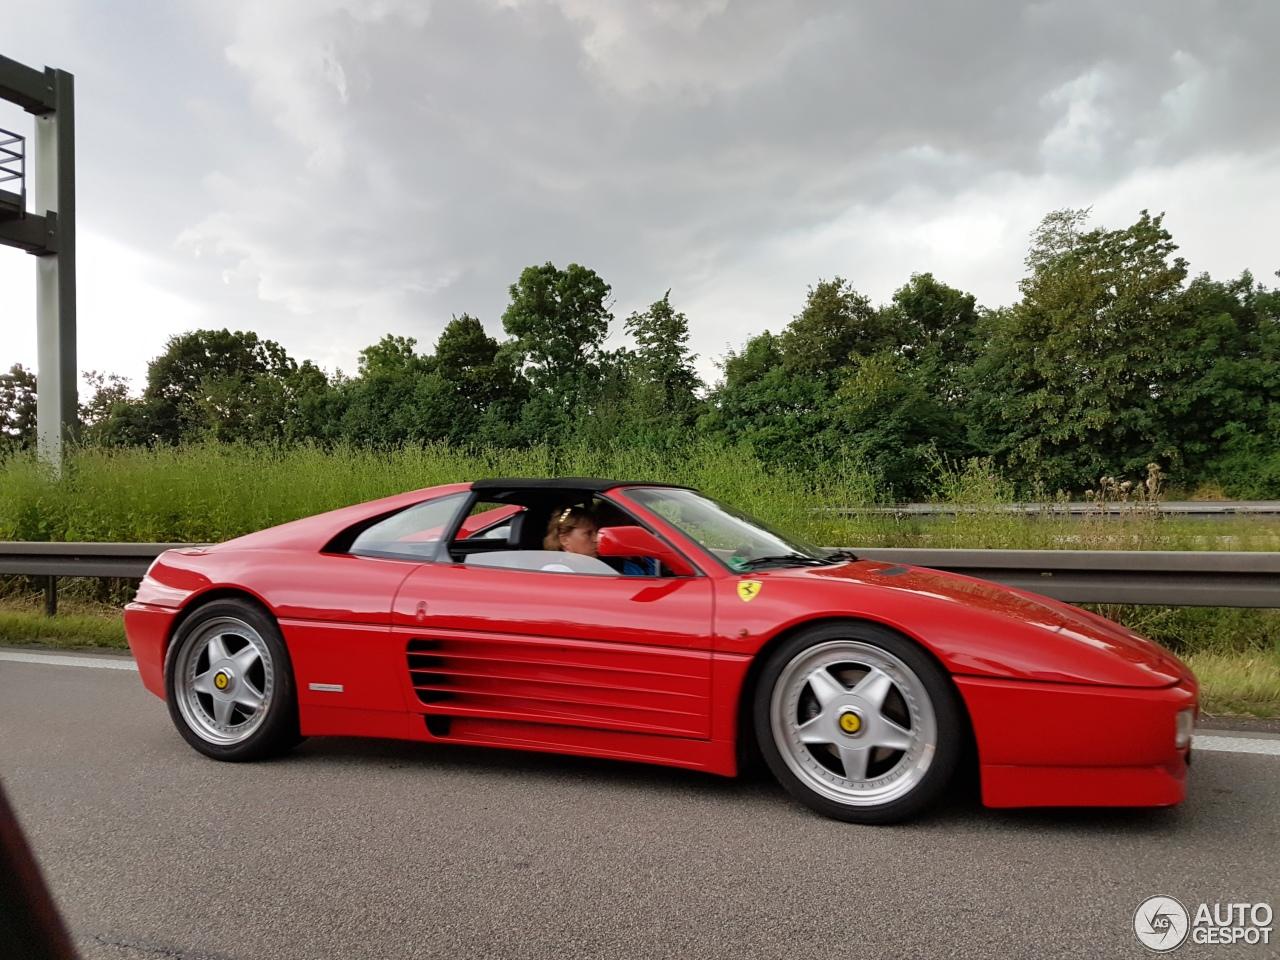 Ferrari F40 For Sale >> Ferrari 348 TS - 22 July 2016 - Autogespot